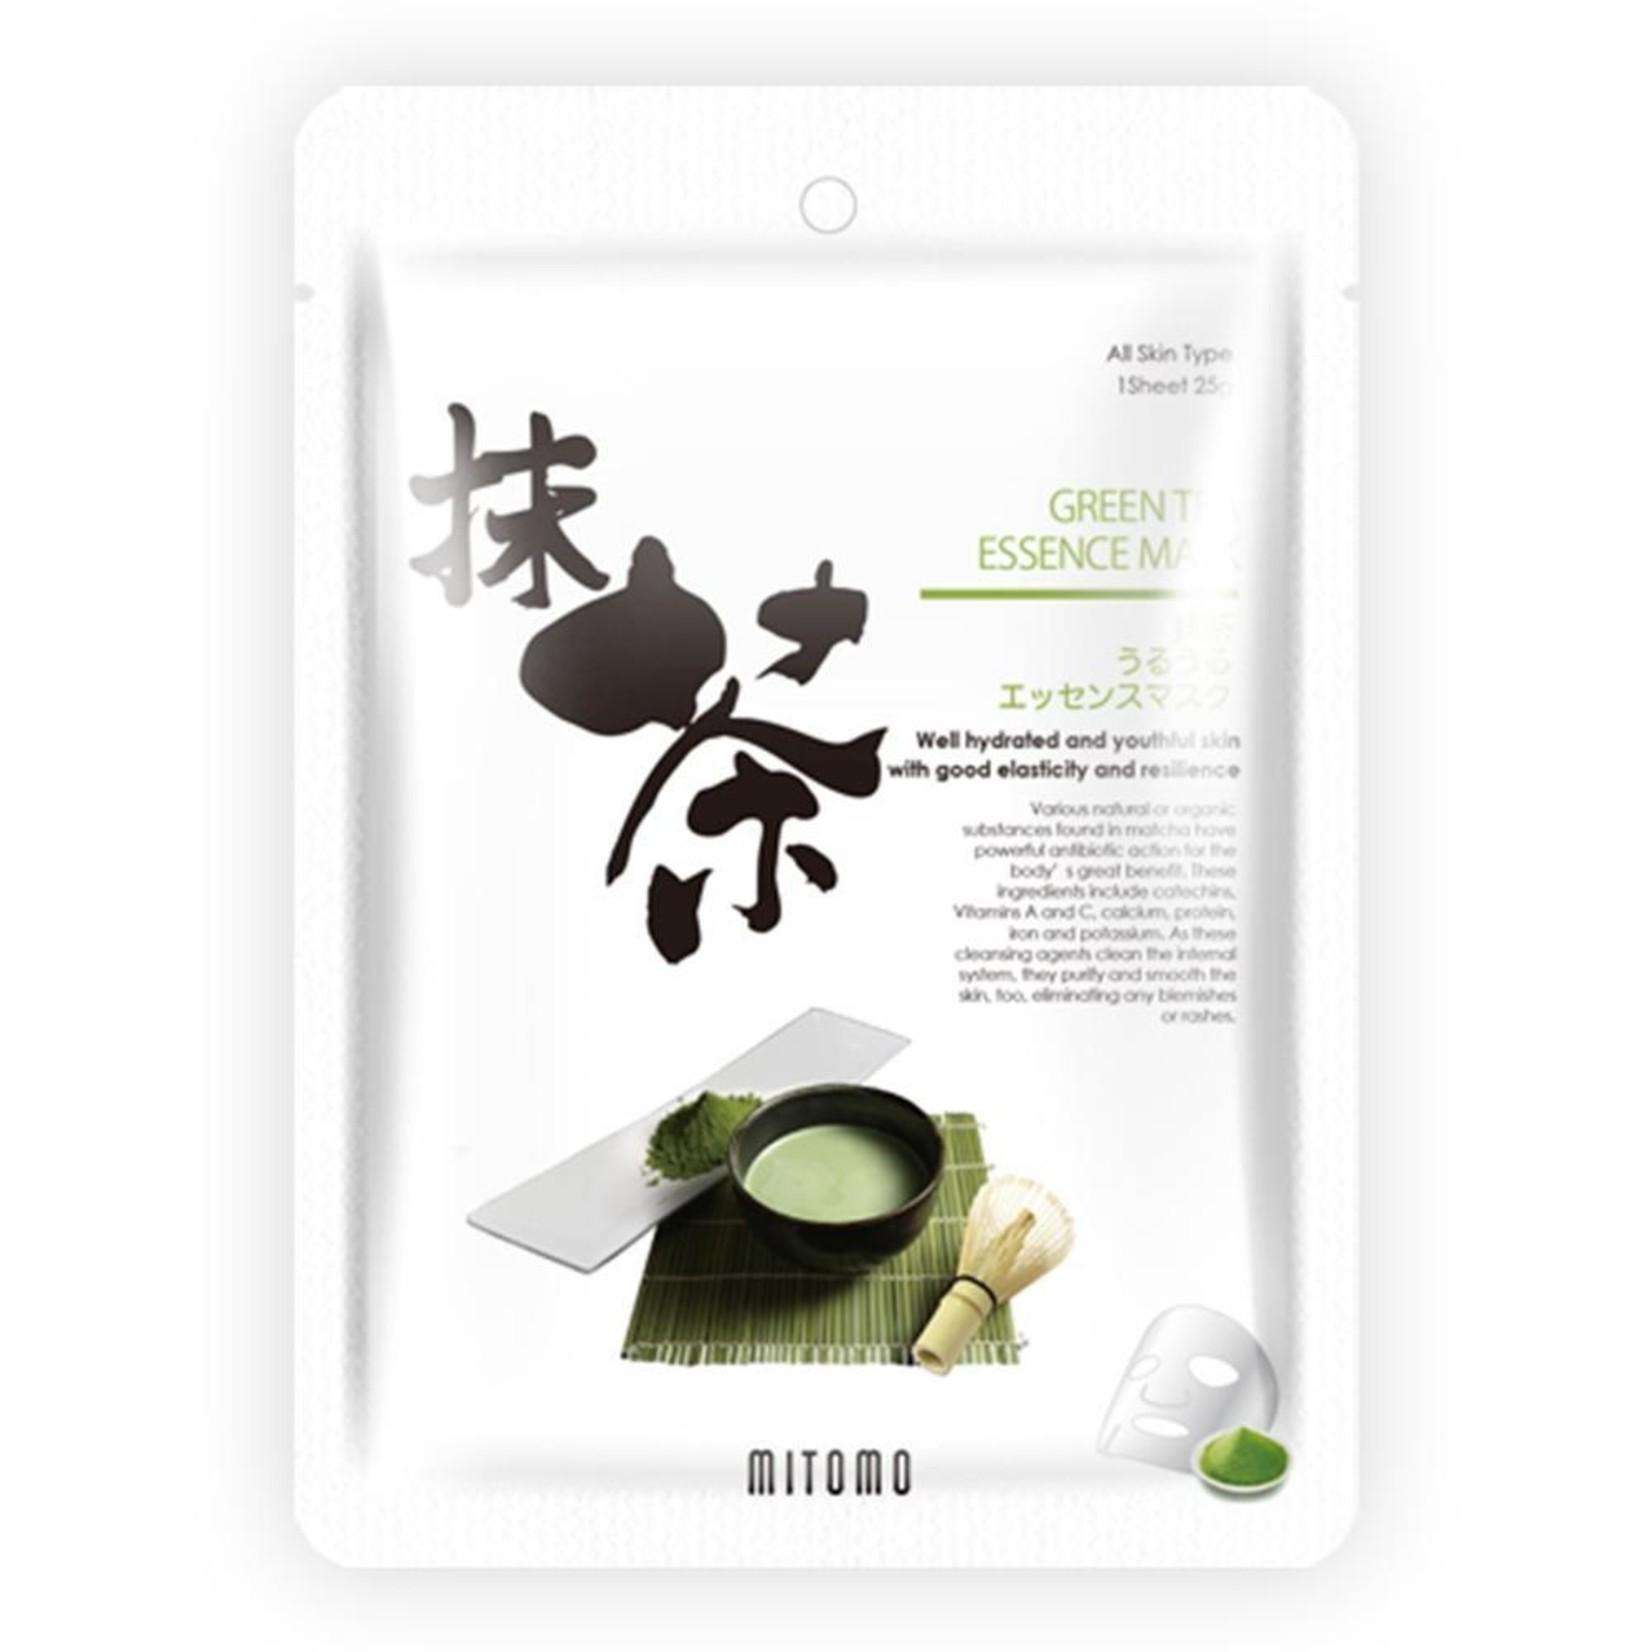 MITOMO Green Tea Matcha Facial Essence Mask